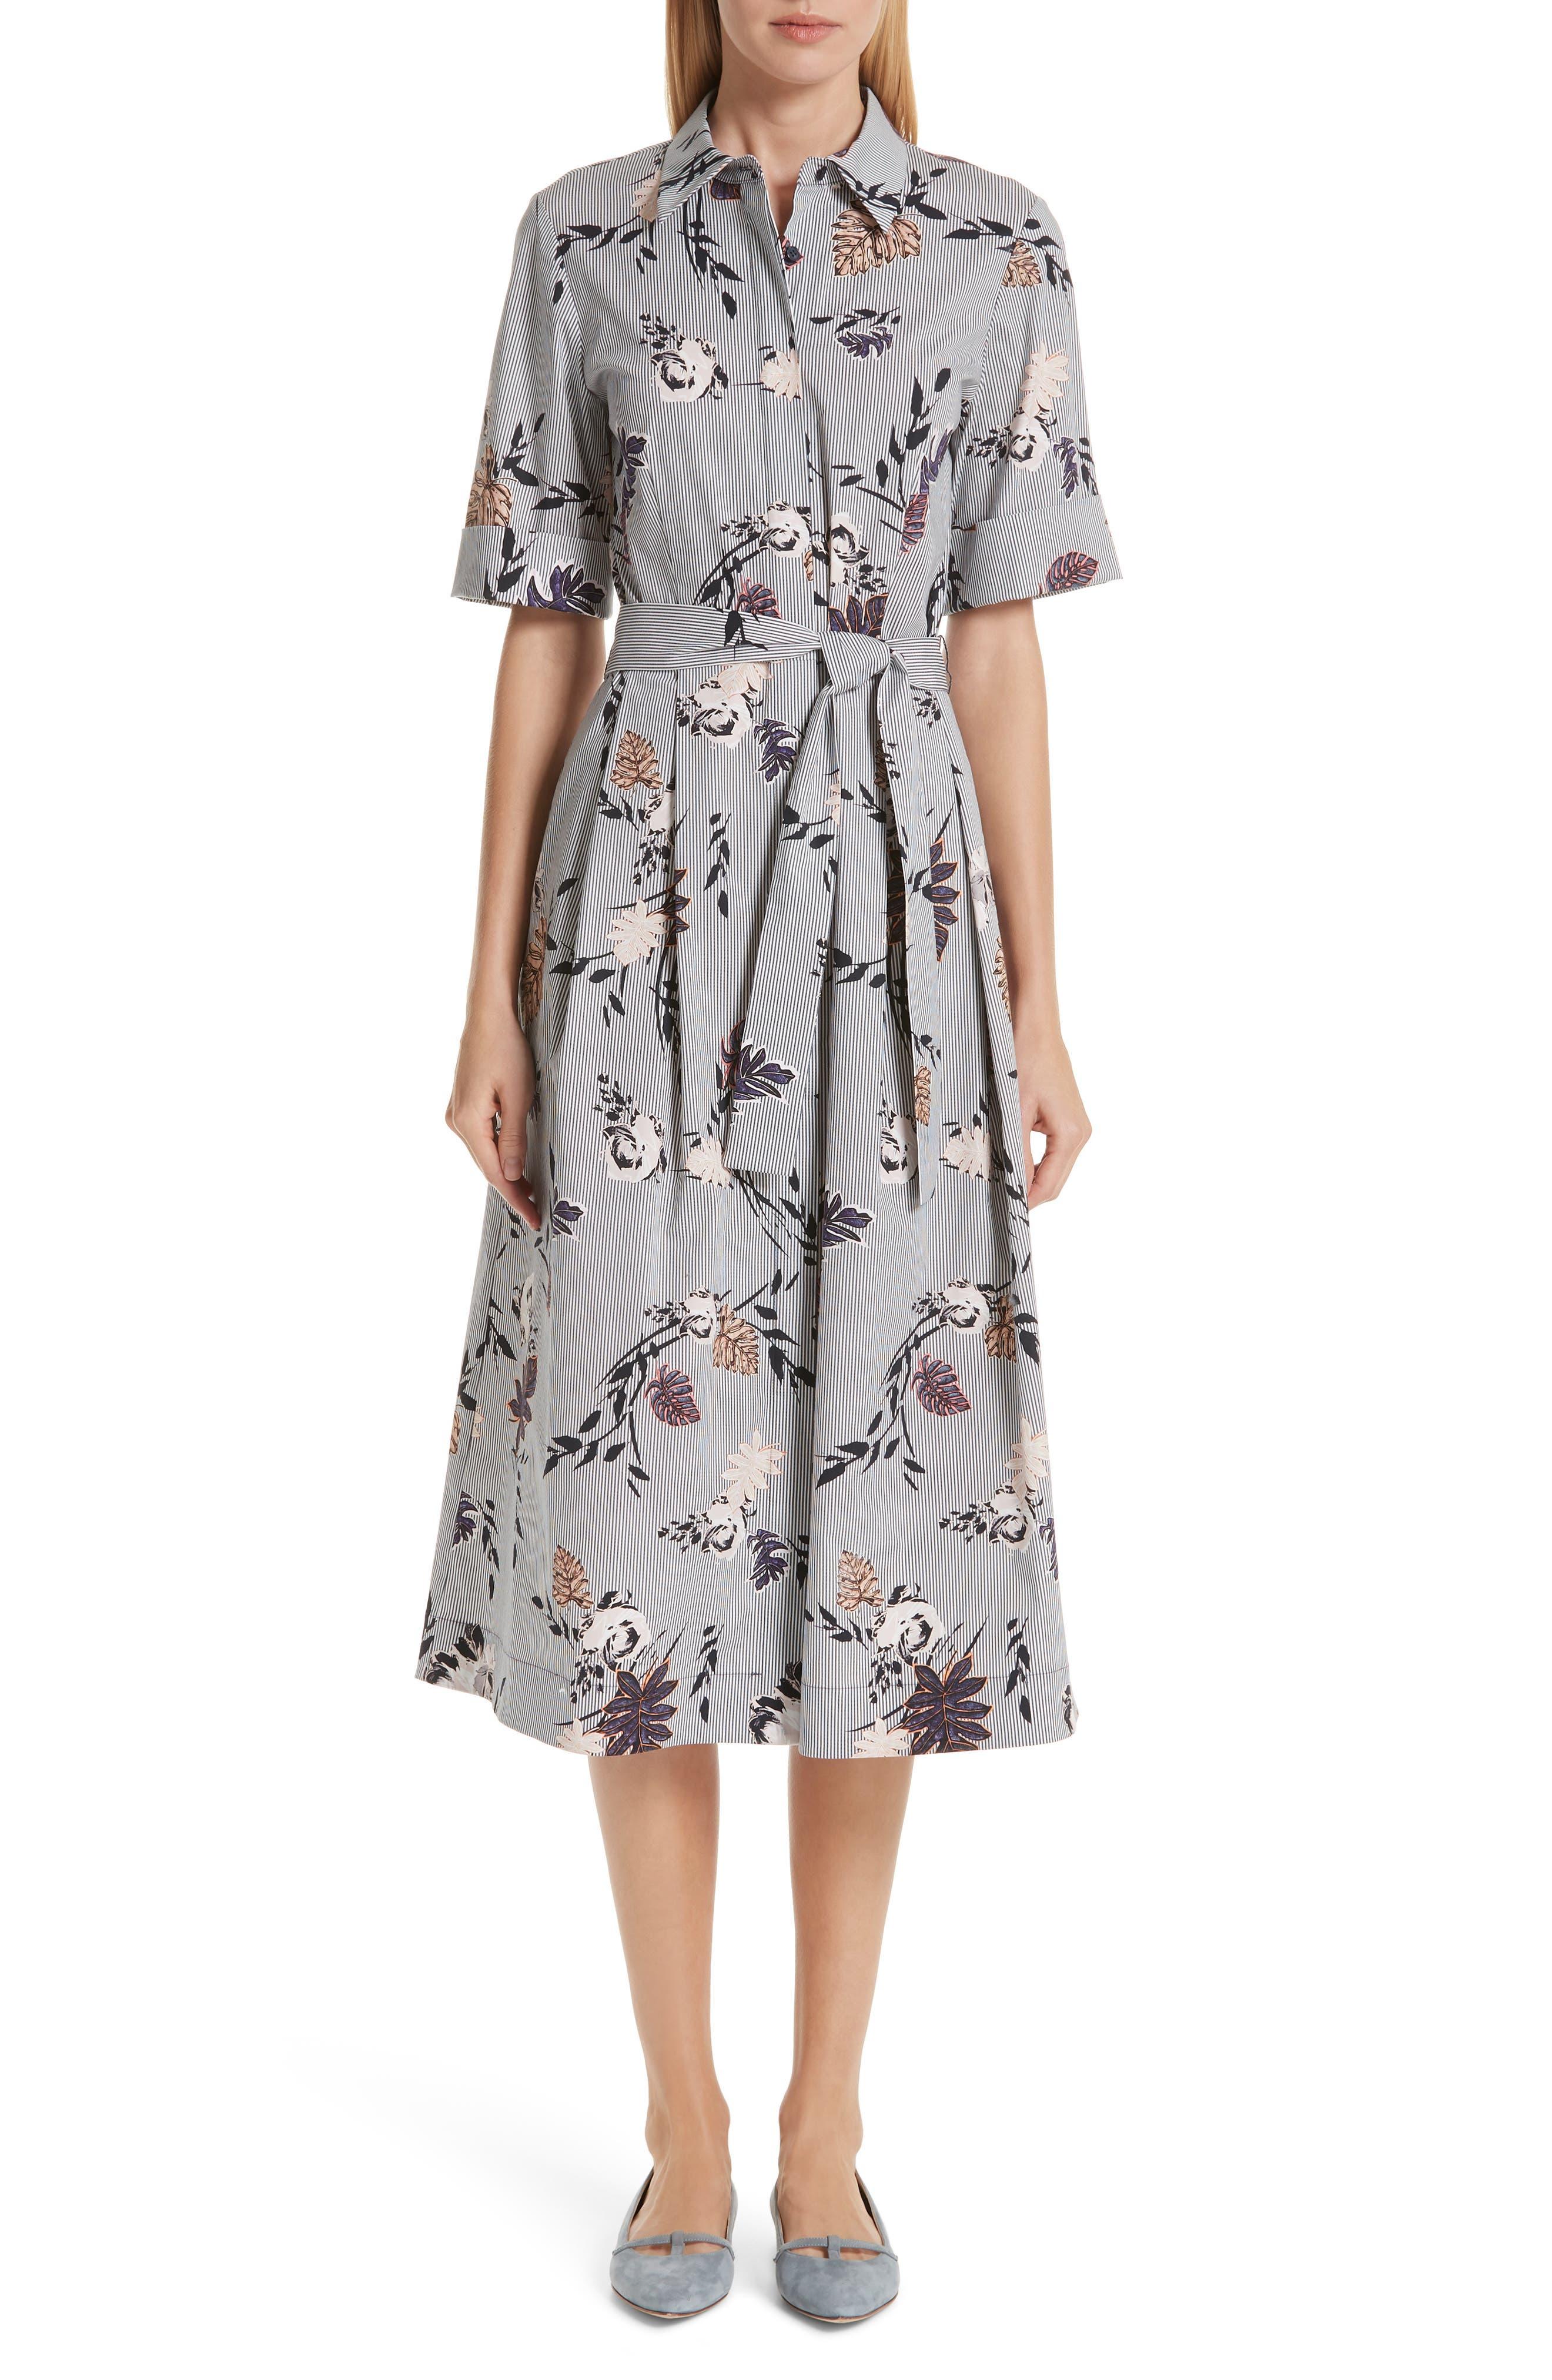 LAFAYETTE 148 NEW YORK Eleni Floral Stripe Shirtdress, Main, color, INK MULTI